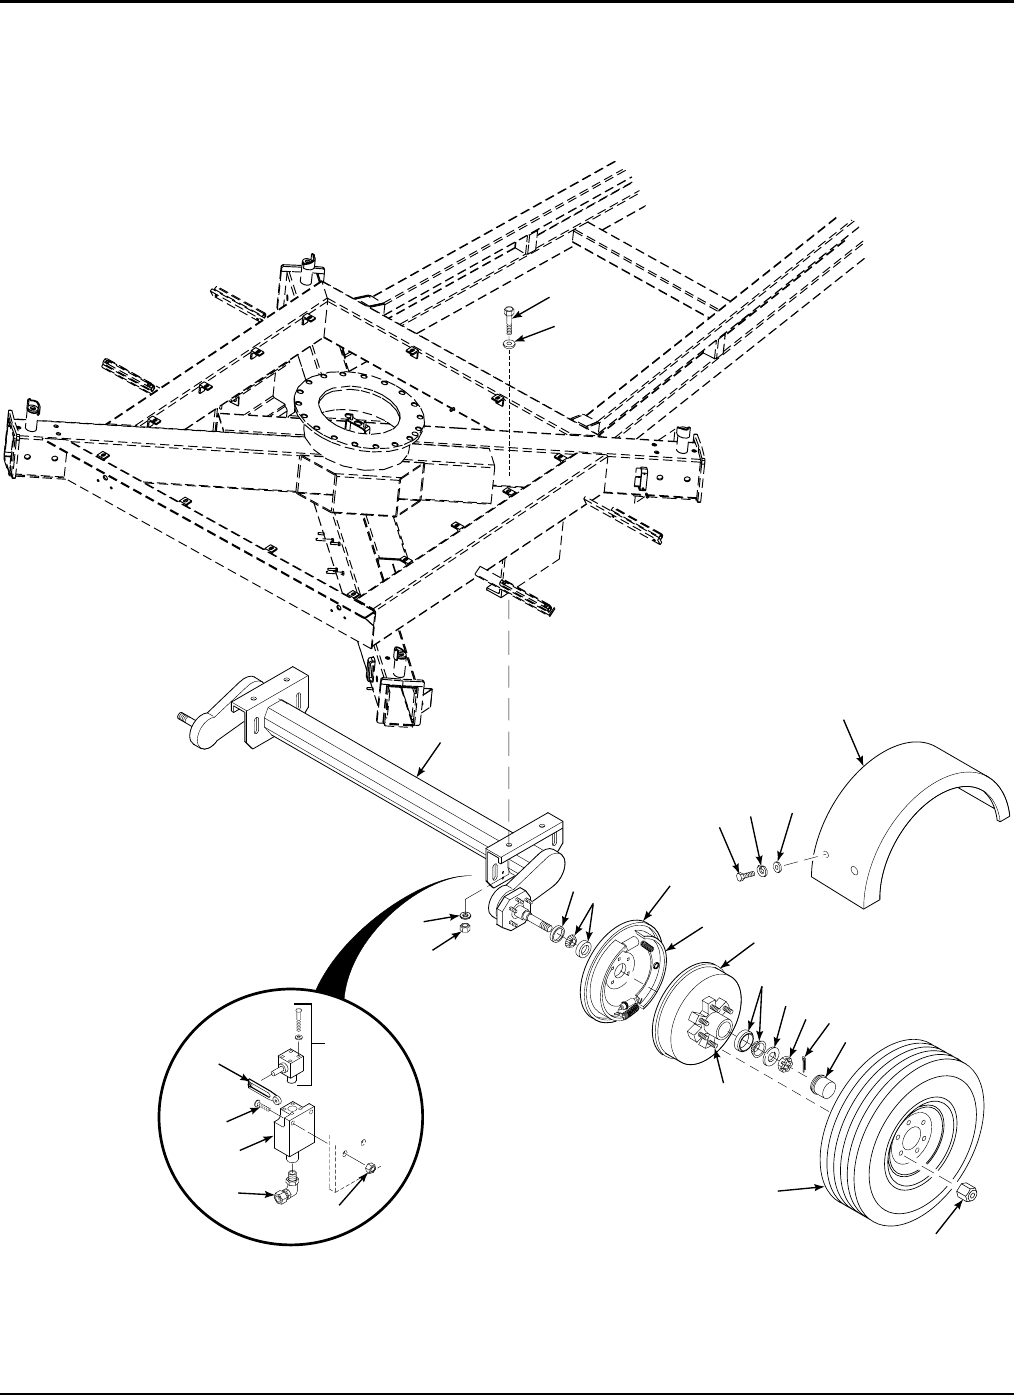 Bil Jax Wheelchair Xlb 4232 Dc Users Manual Introduction